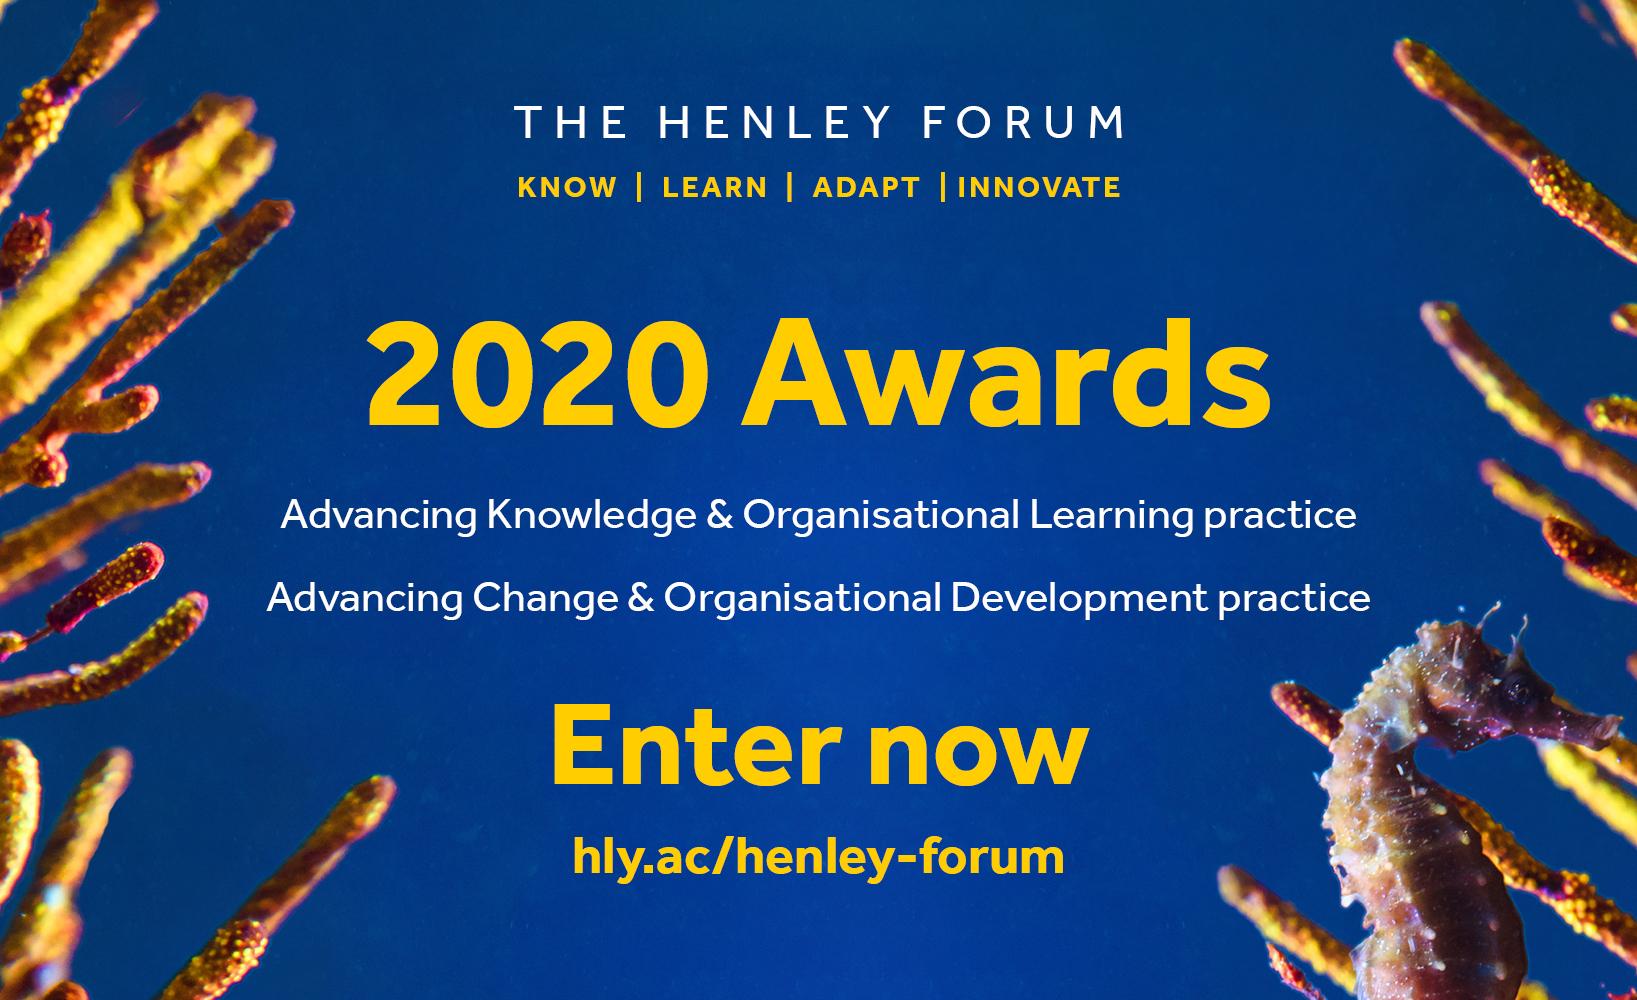 The Henley Forum 2020 Awards | Henley Business School